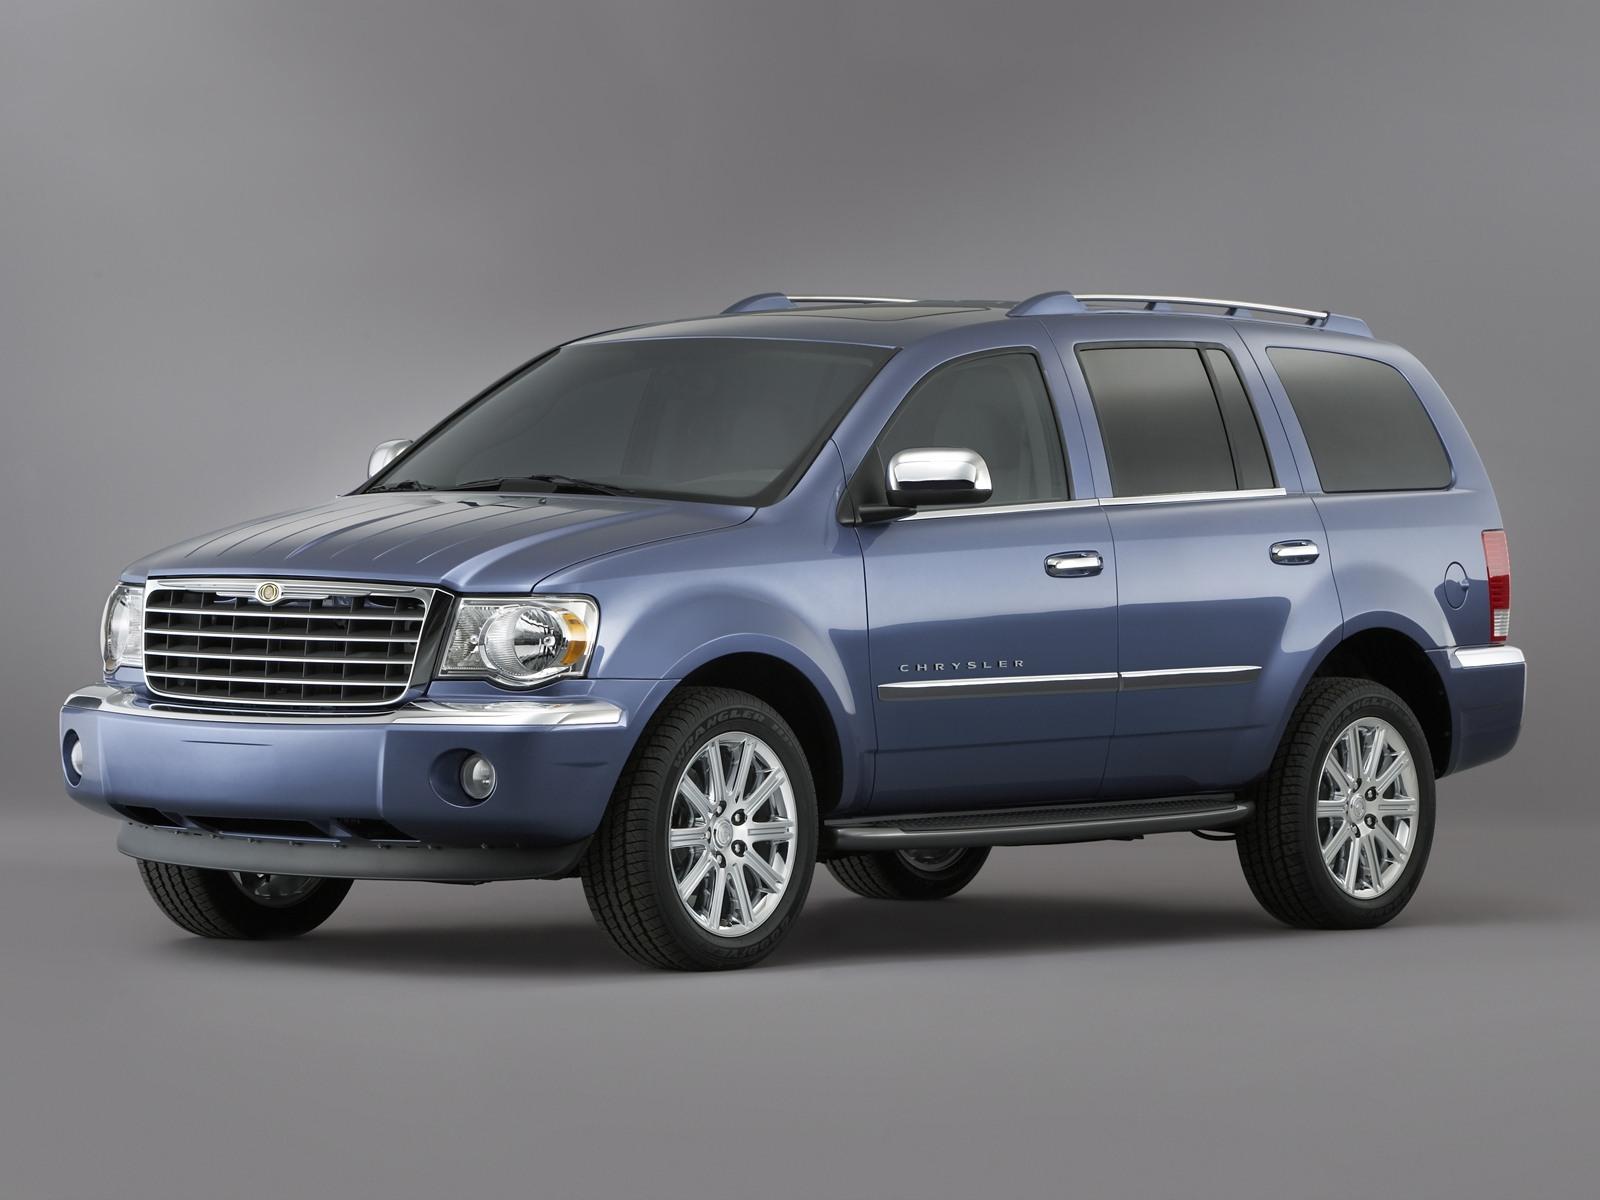 Chrysler Aspen (Крайслер Аспен) 2020 - обзор модели c фото ...